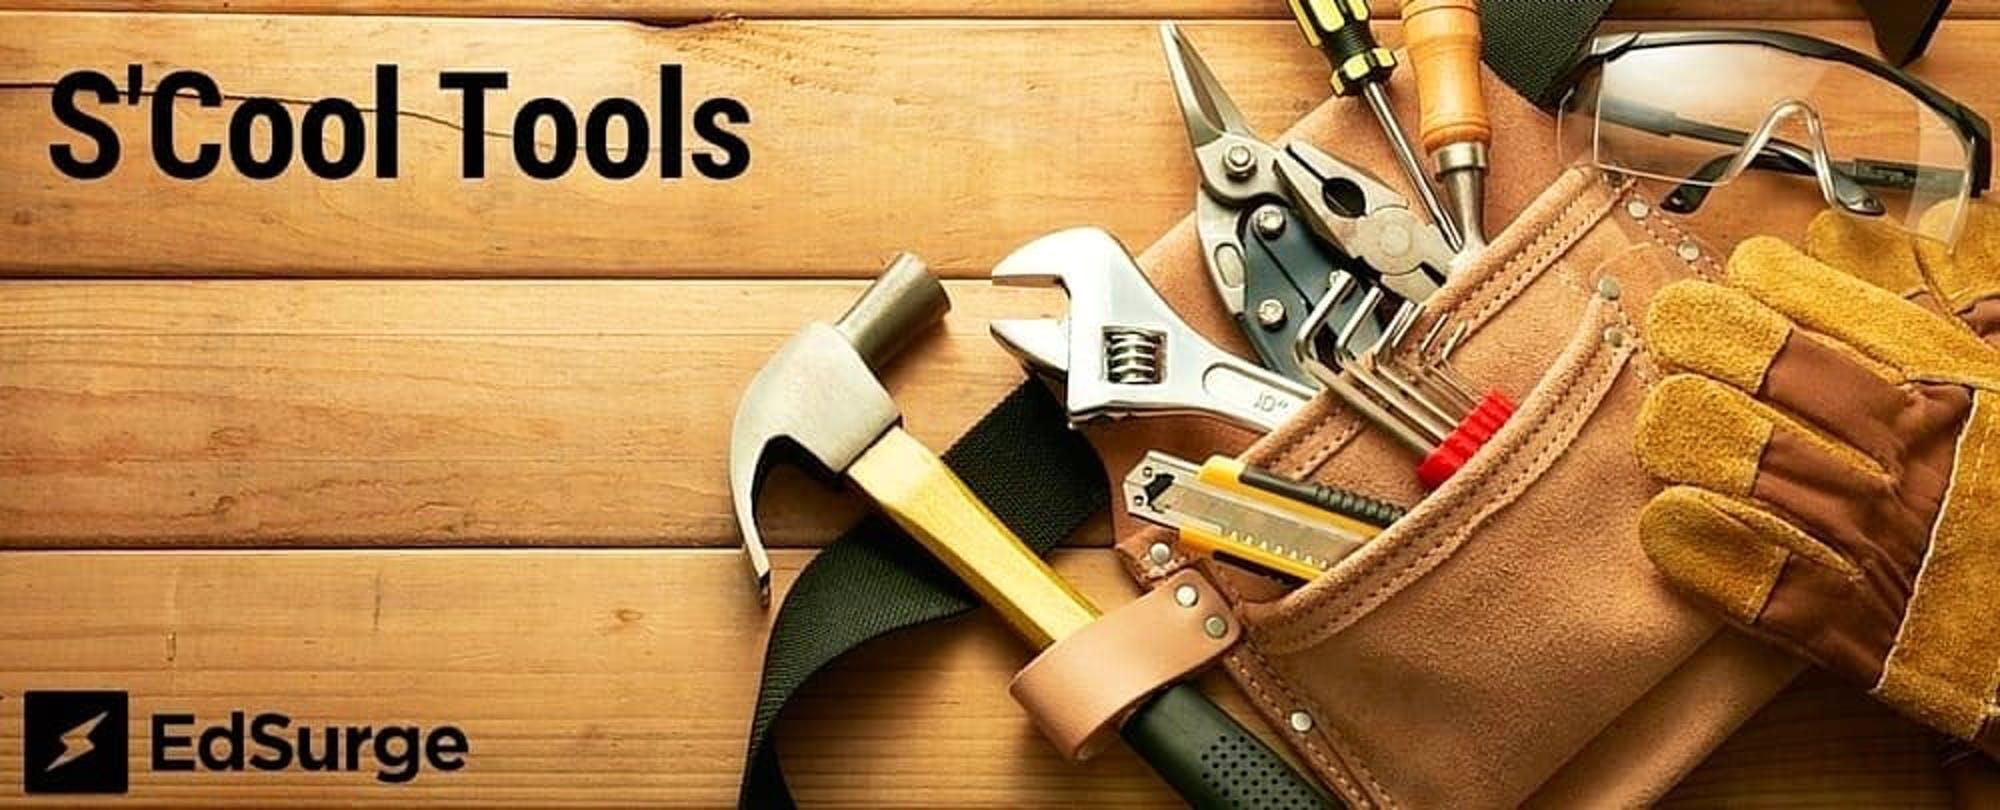 S'Cool Tools, Teacher Voice Edition: Woot Math, WebAssign, Achieve3000